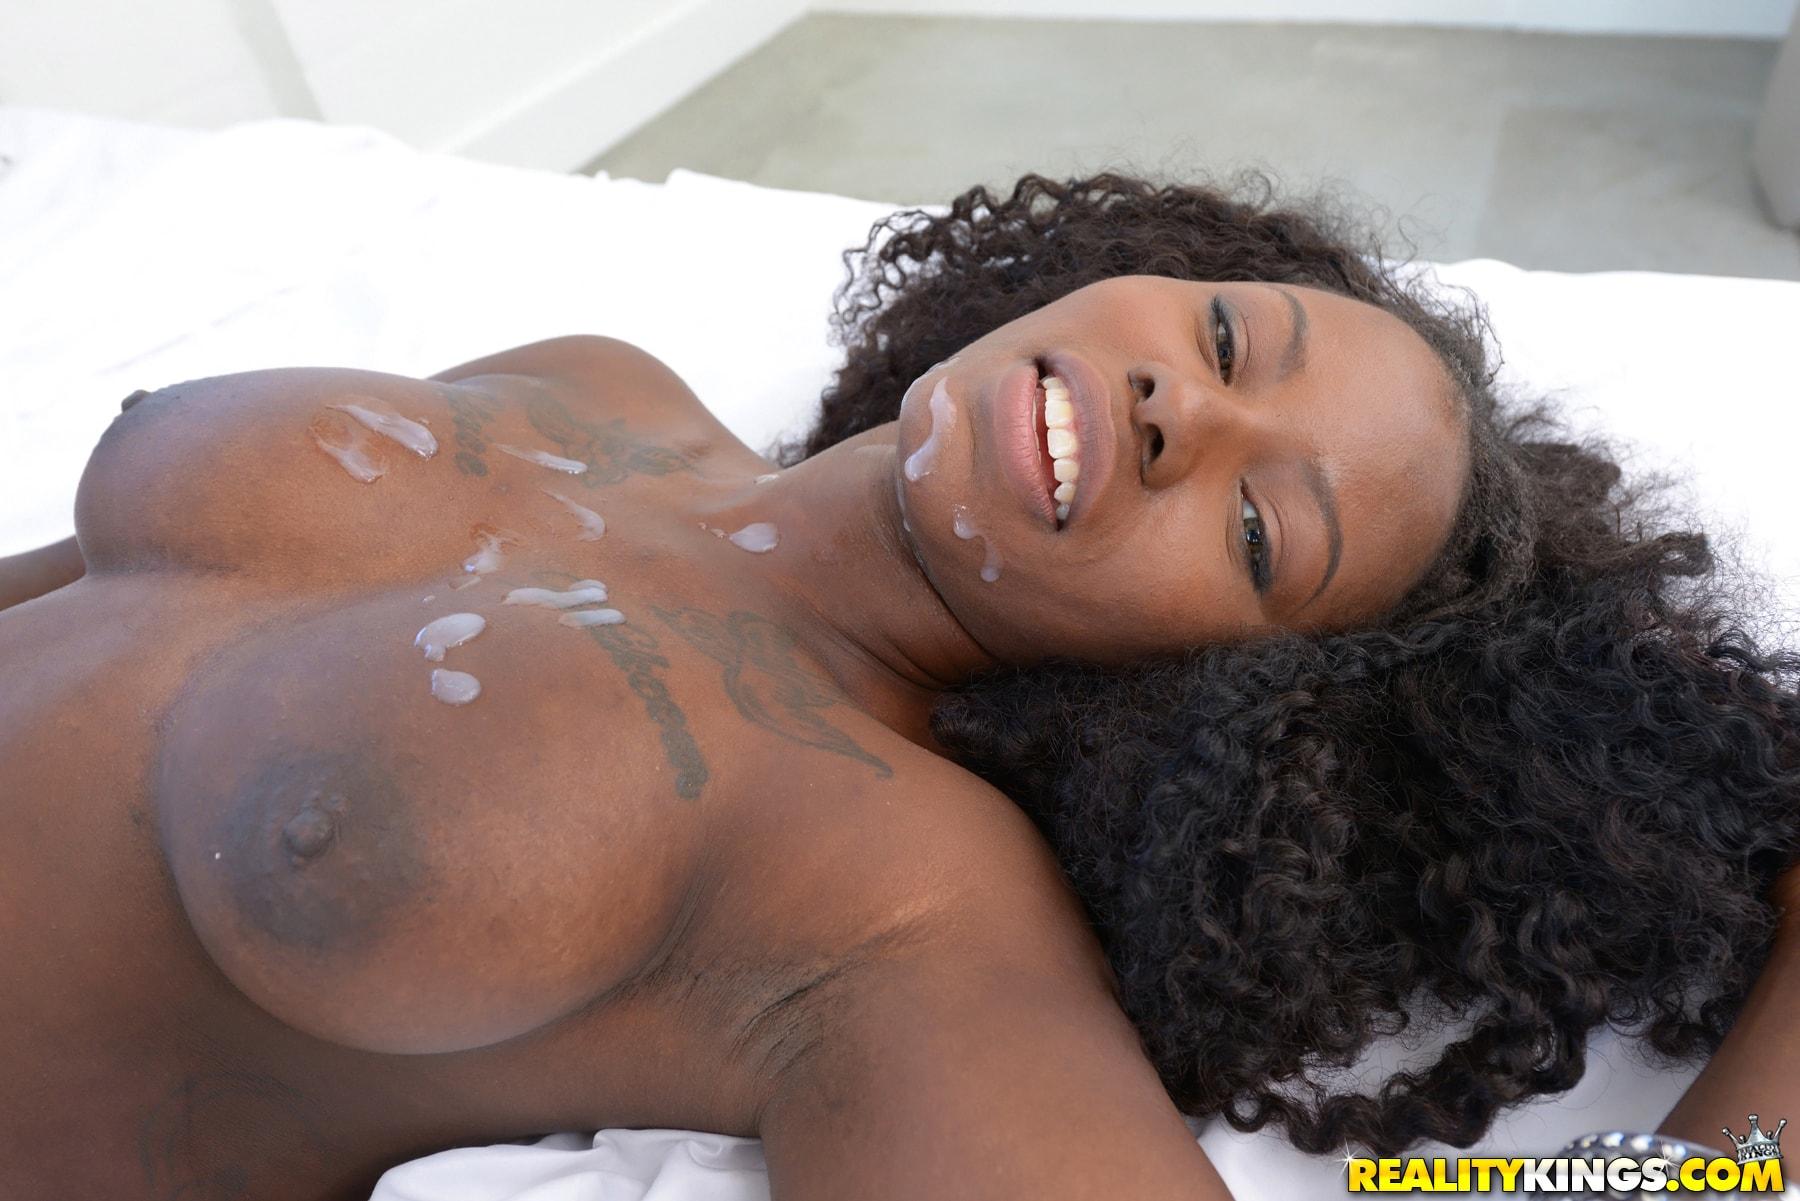 Reality Kings 'Feeling on jamaica' starring Jamaica B (Photo 252)